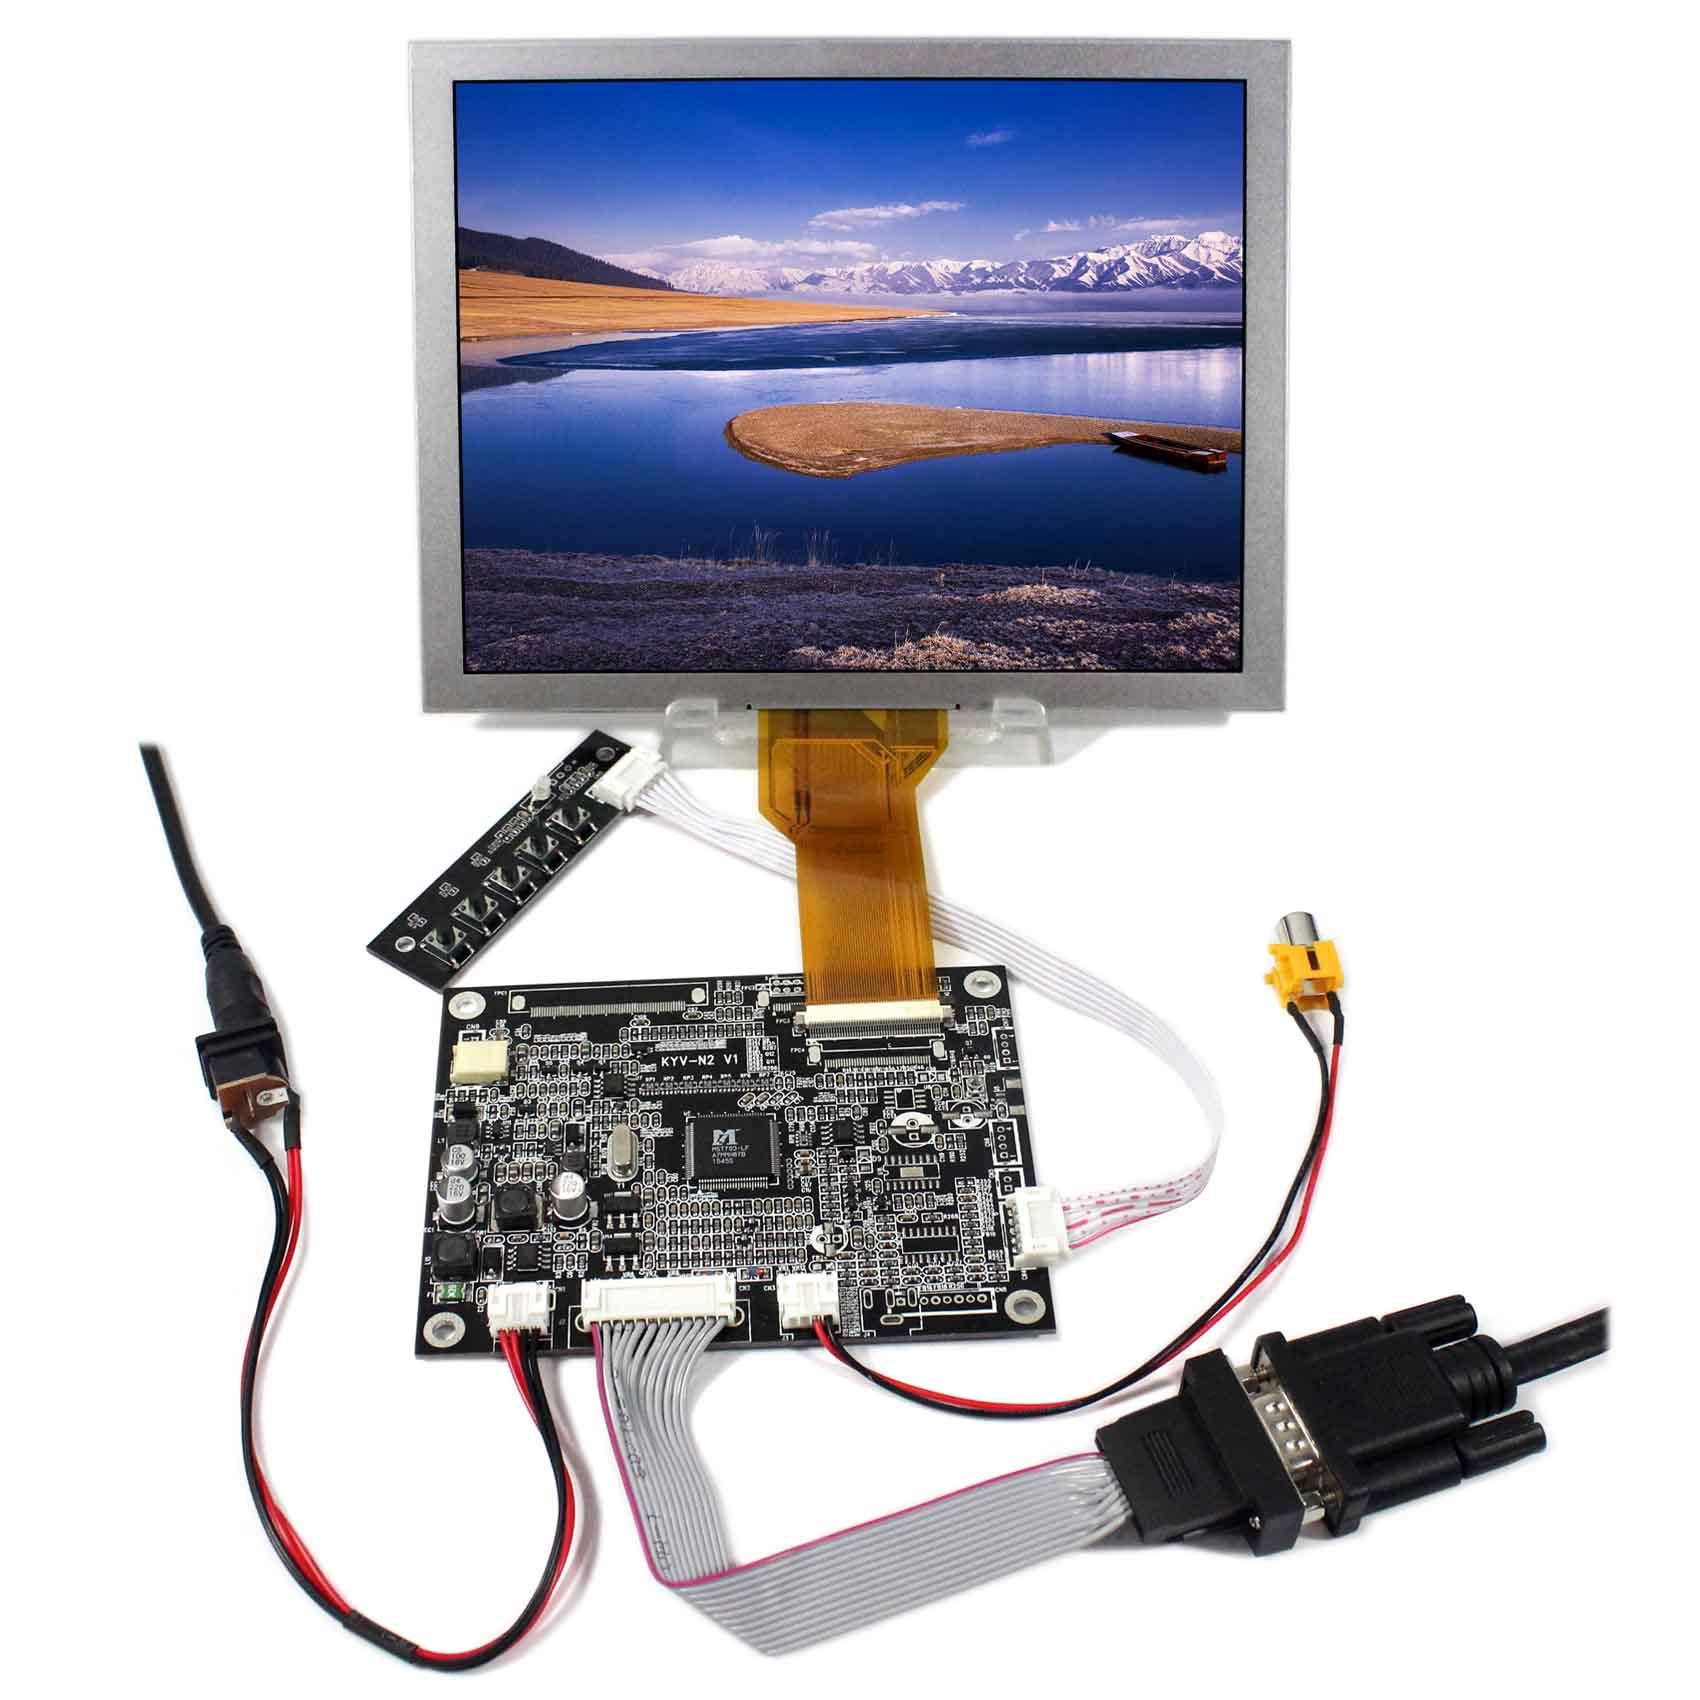 цена VGA AV LCD Controller Board KYV-N2 V1+8inch EJ080NA-05B 800x600 LCD Screen